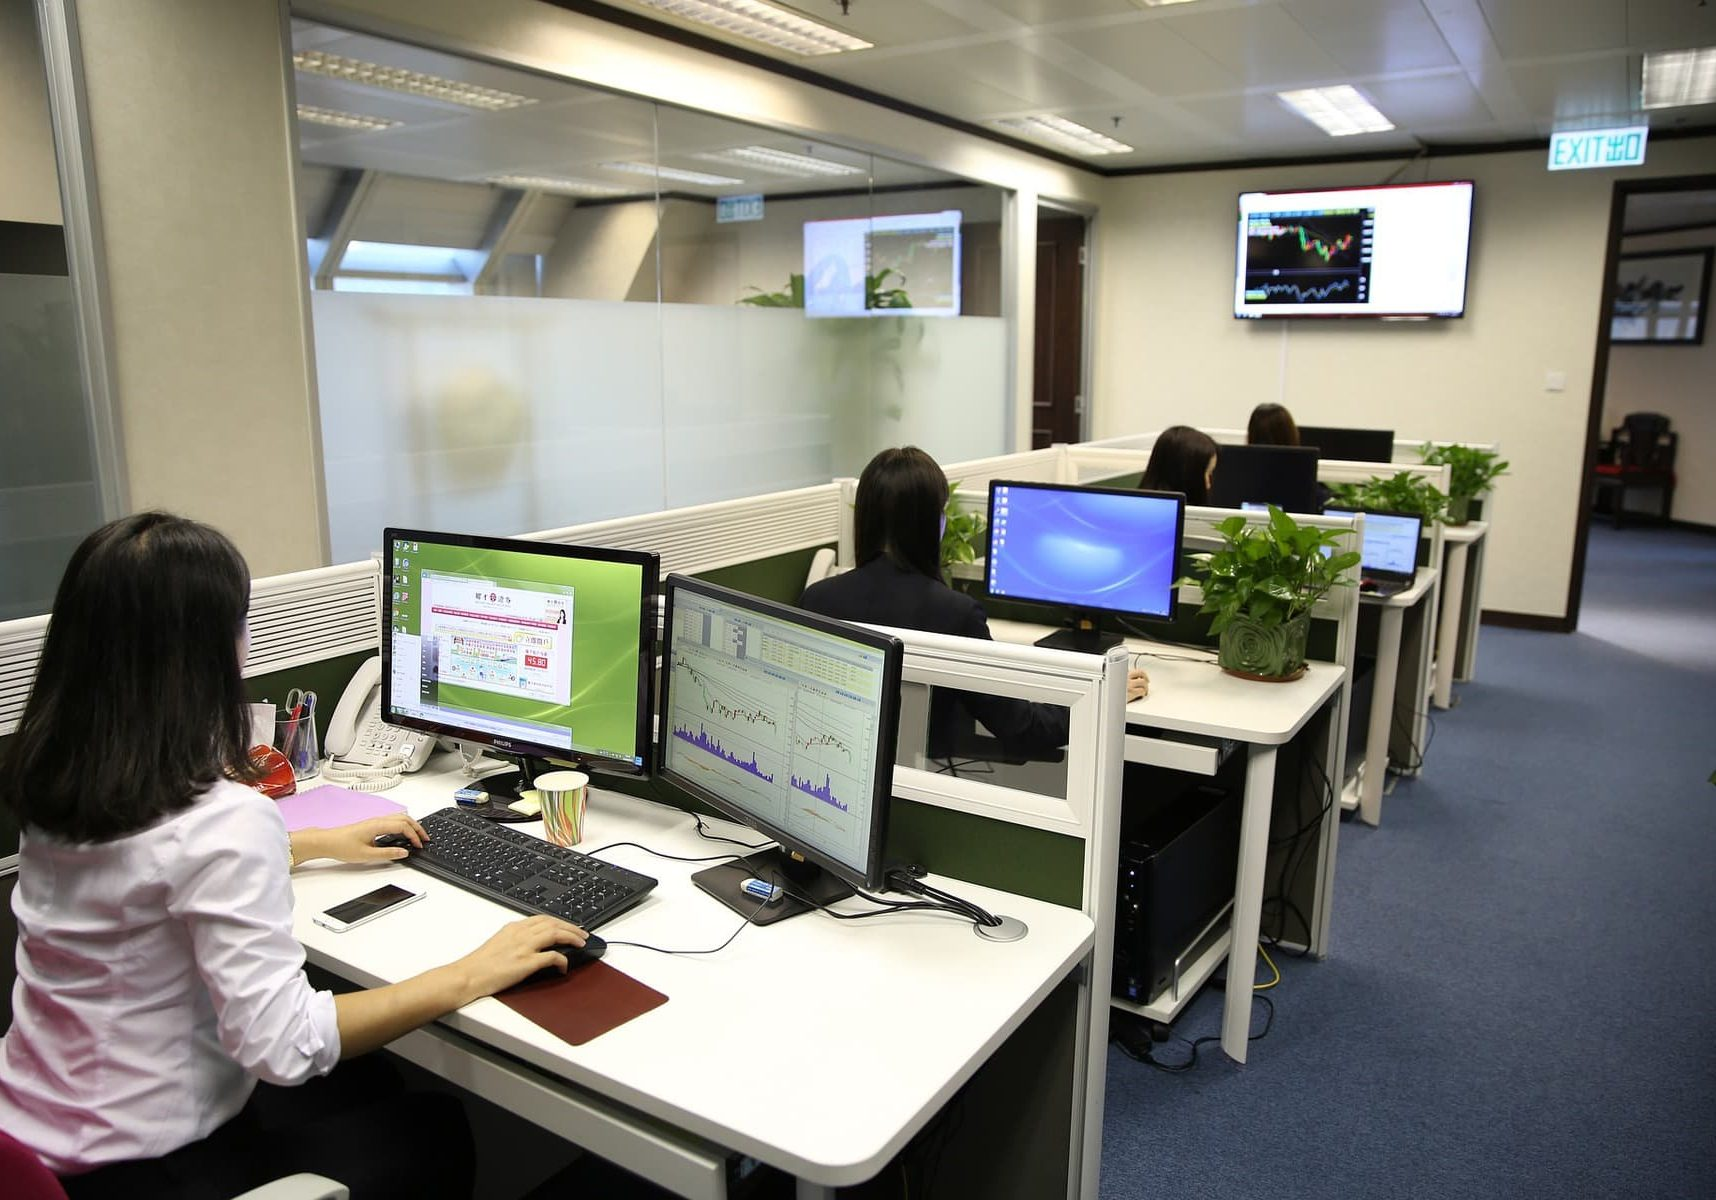 IT Services desks Ventilate the workplace